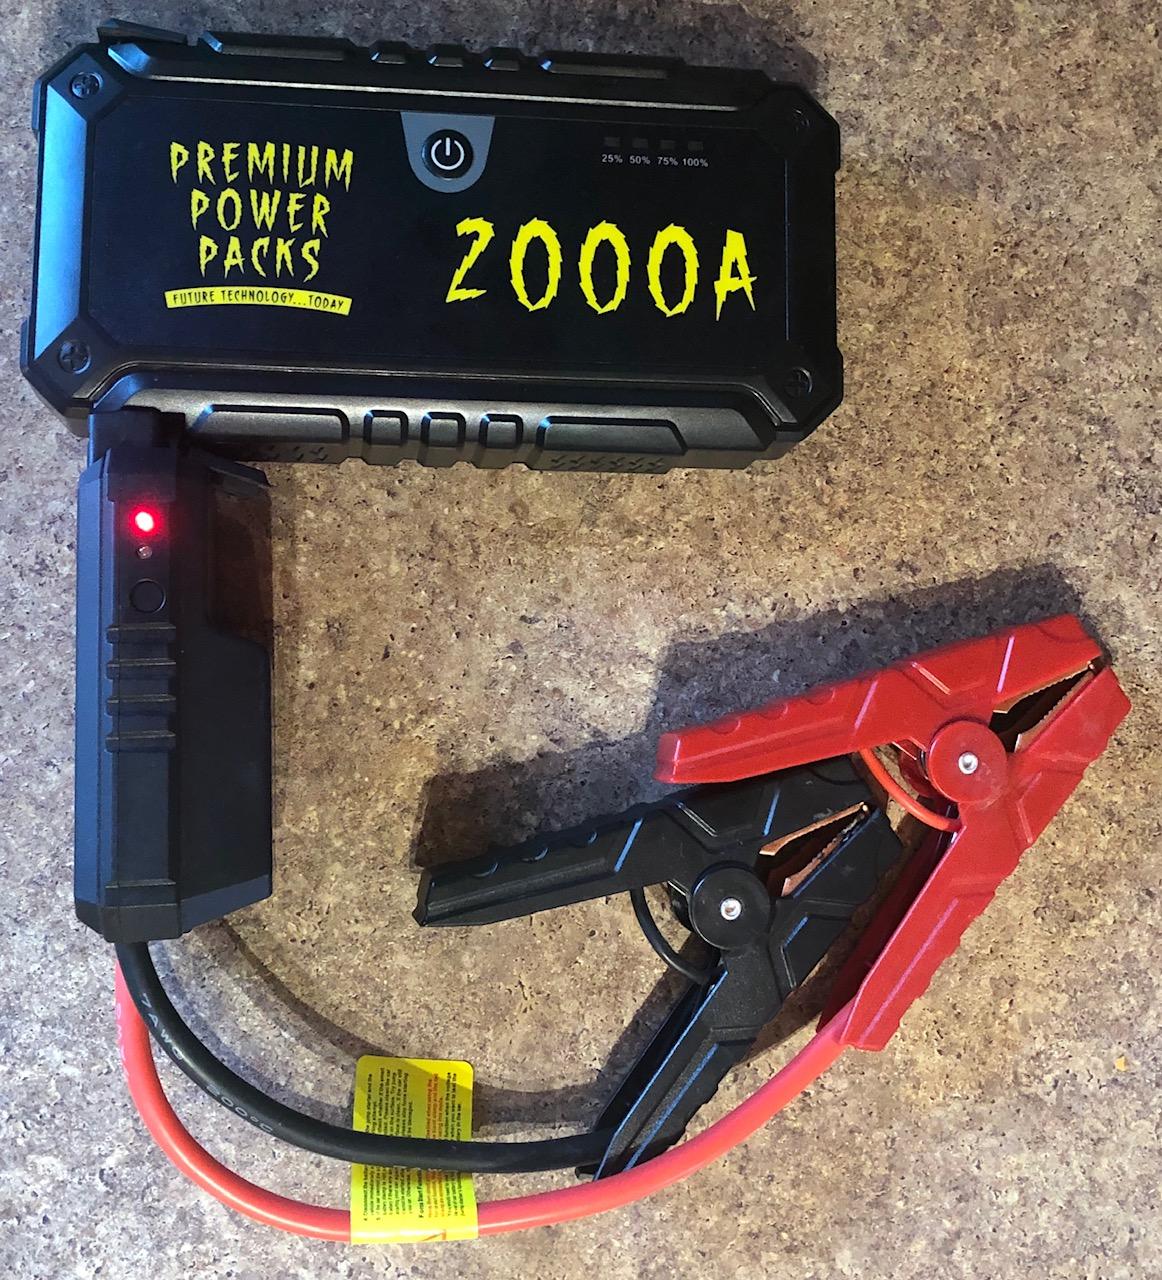 2000A wires.jpg